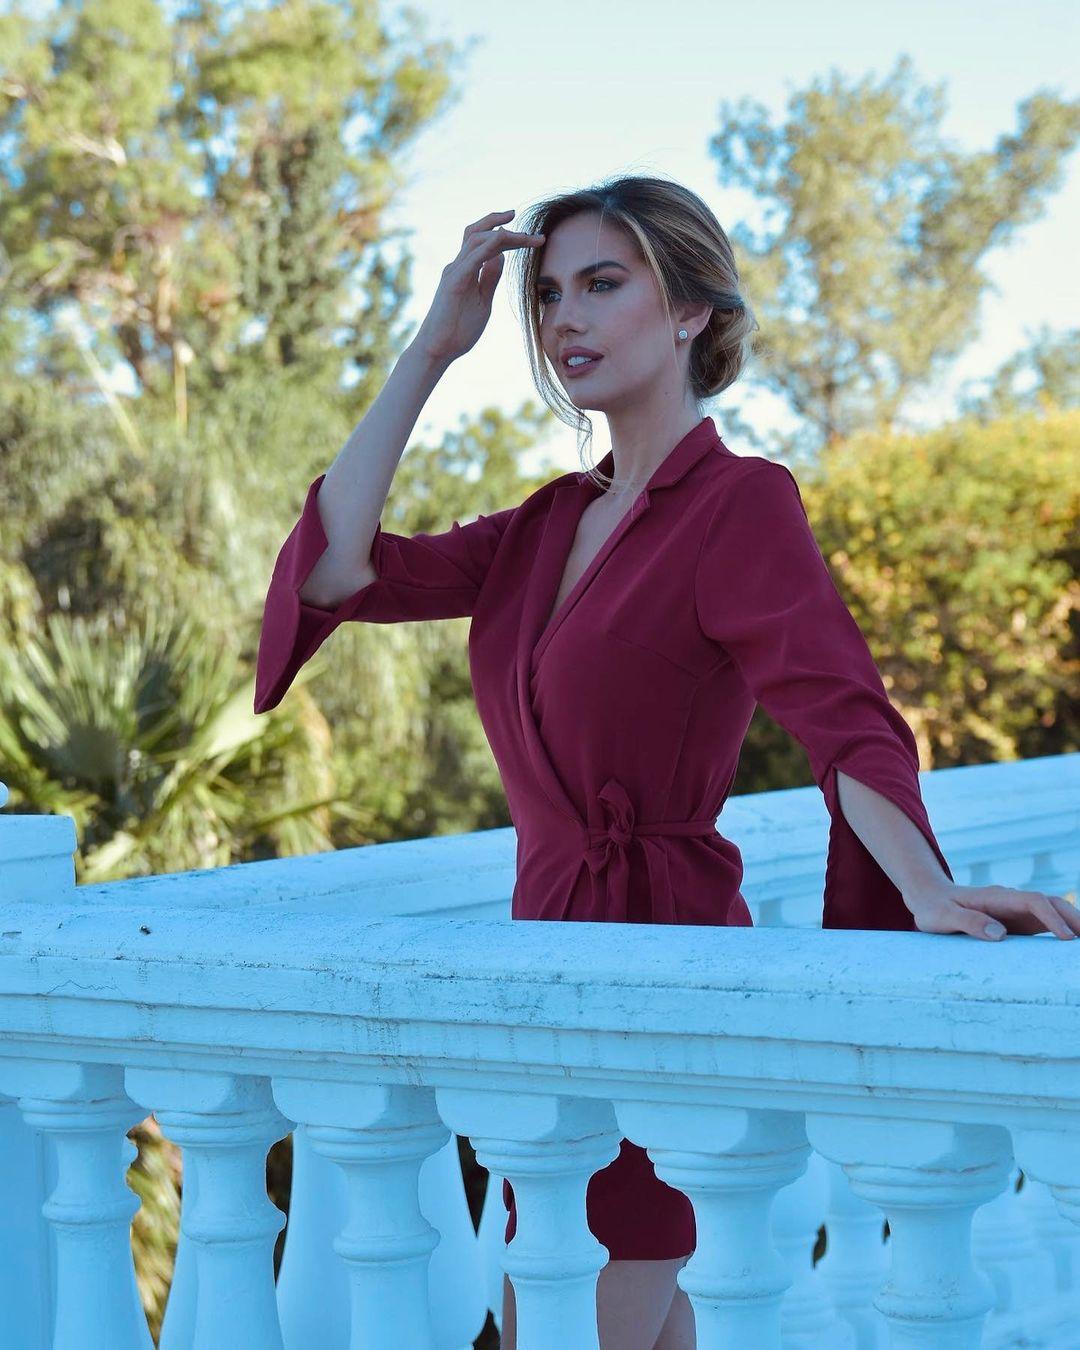 alina akselrad, top 21 de miss universe 2020. - Página 4 W9yrk10